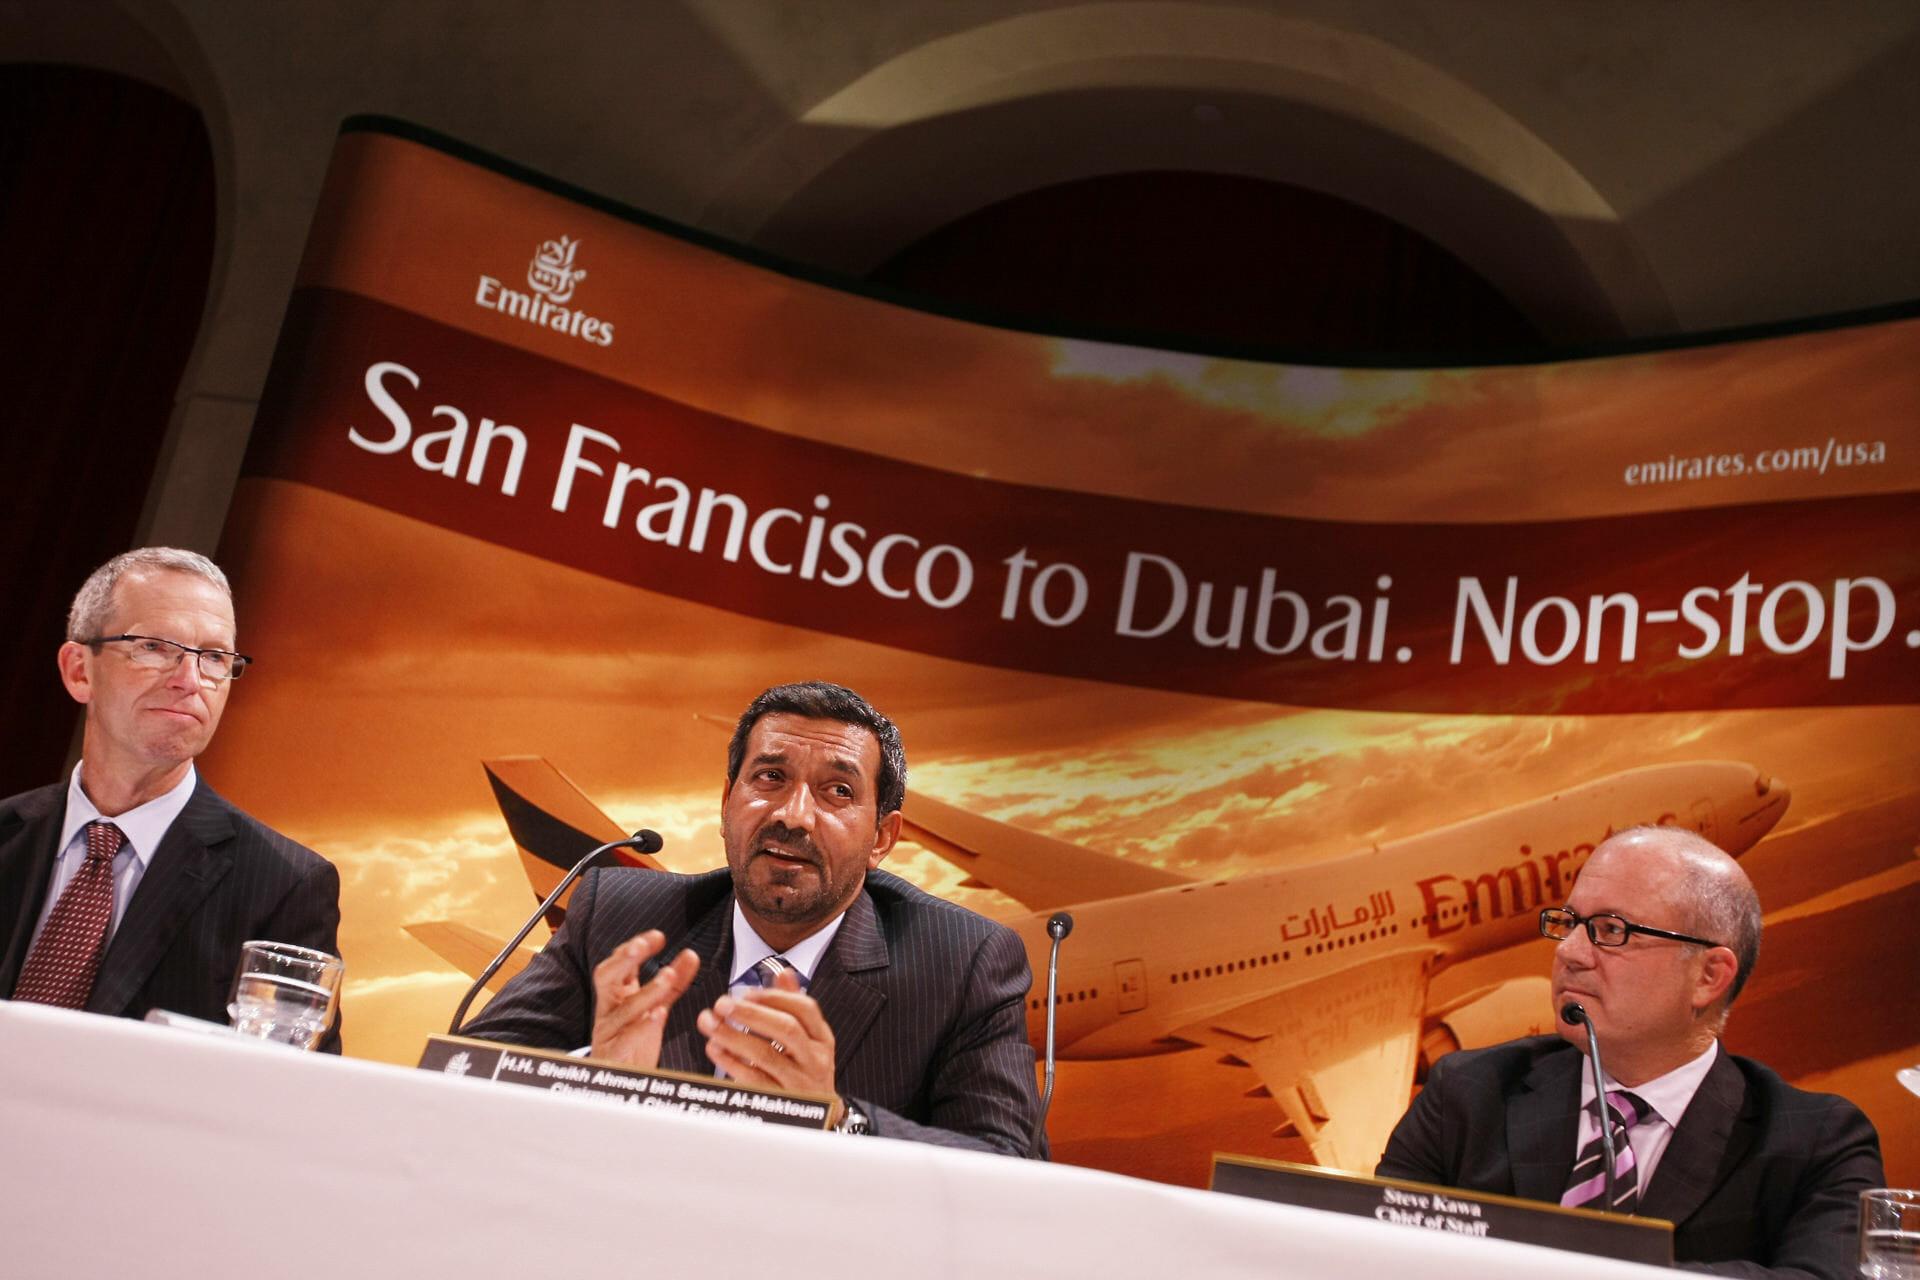 Emirates Air Inaugural Flight @ SFO - San Francisco, CA, USA